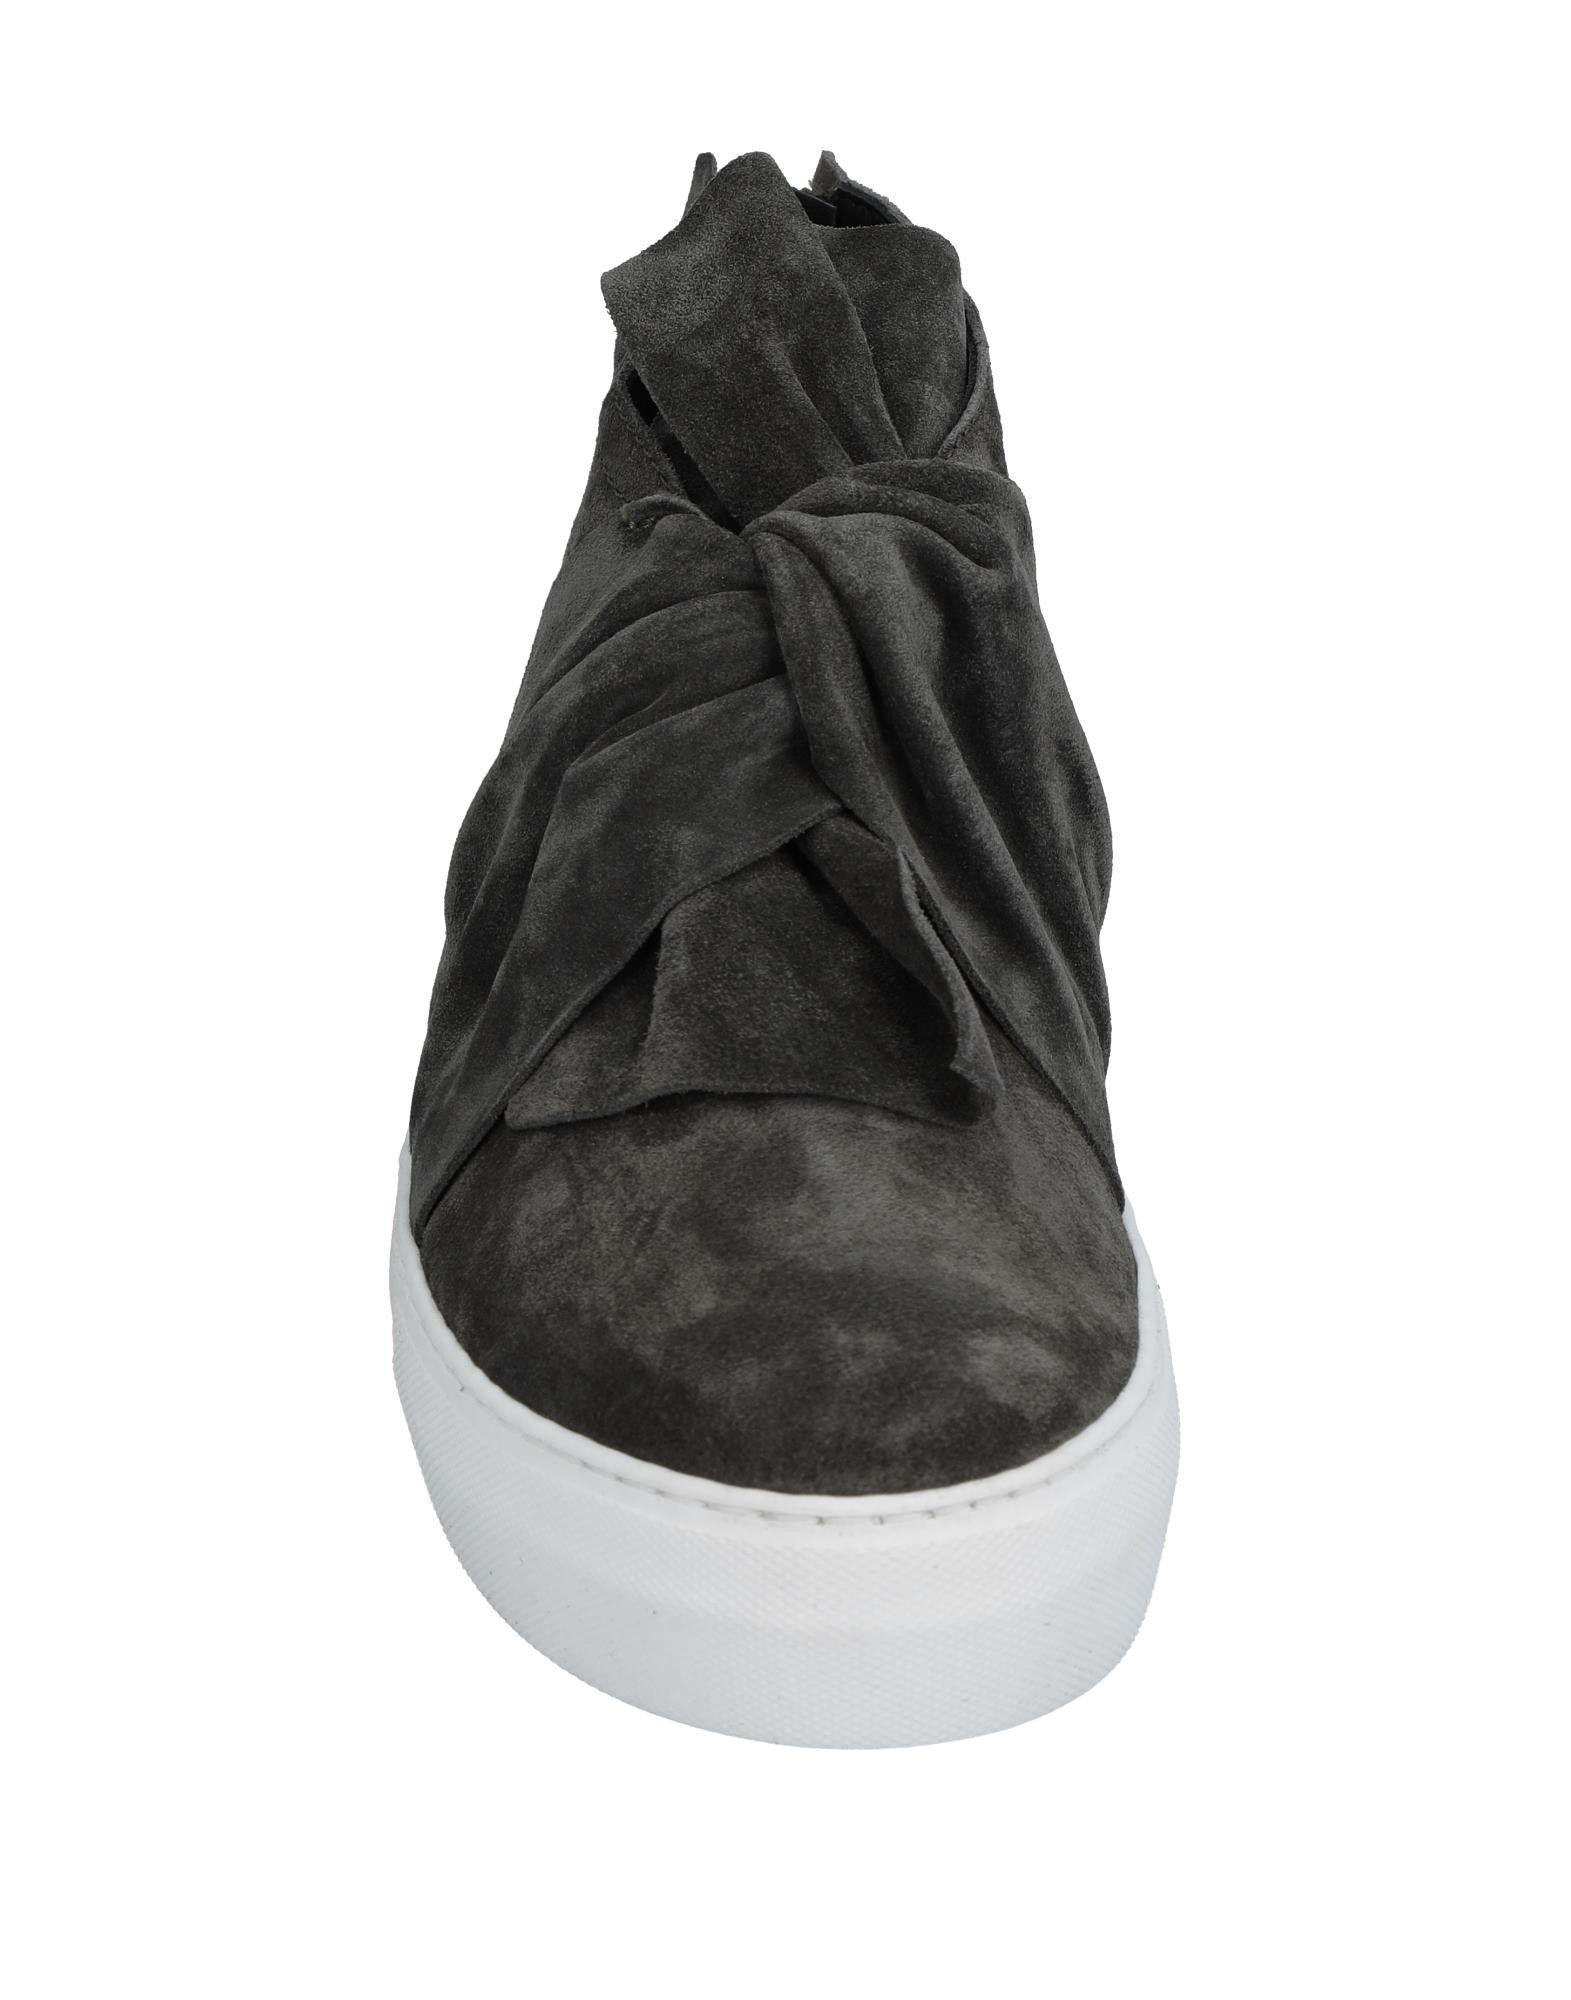 Ports 1961 Gute Sneakers Herren  11527868RS Gute 1961 Qualität beliebte Schuhe d16160